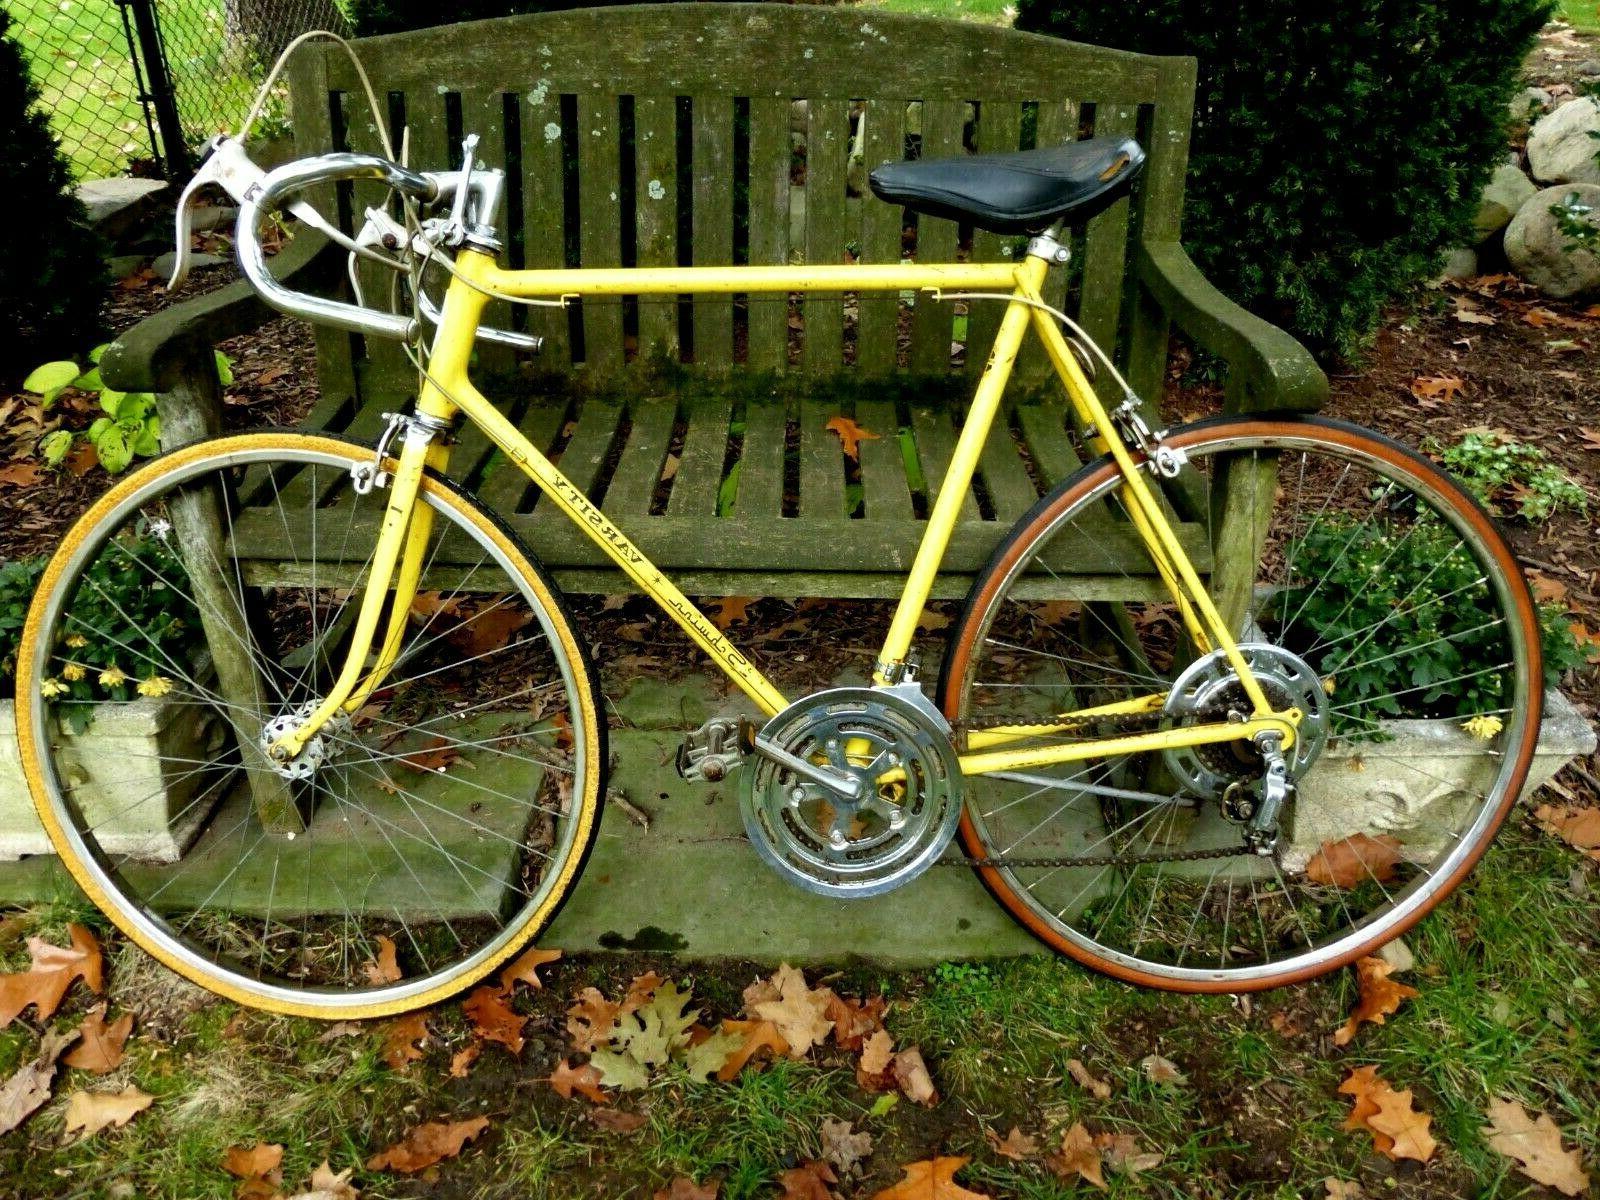 1973 varsity sport vintage touring road bike